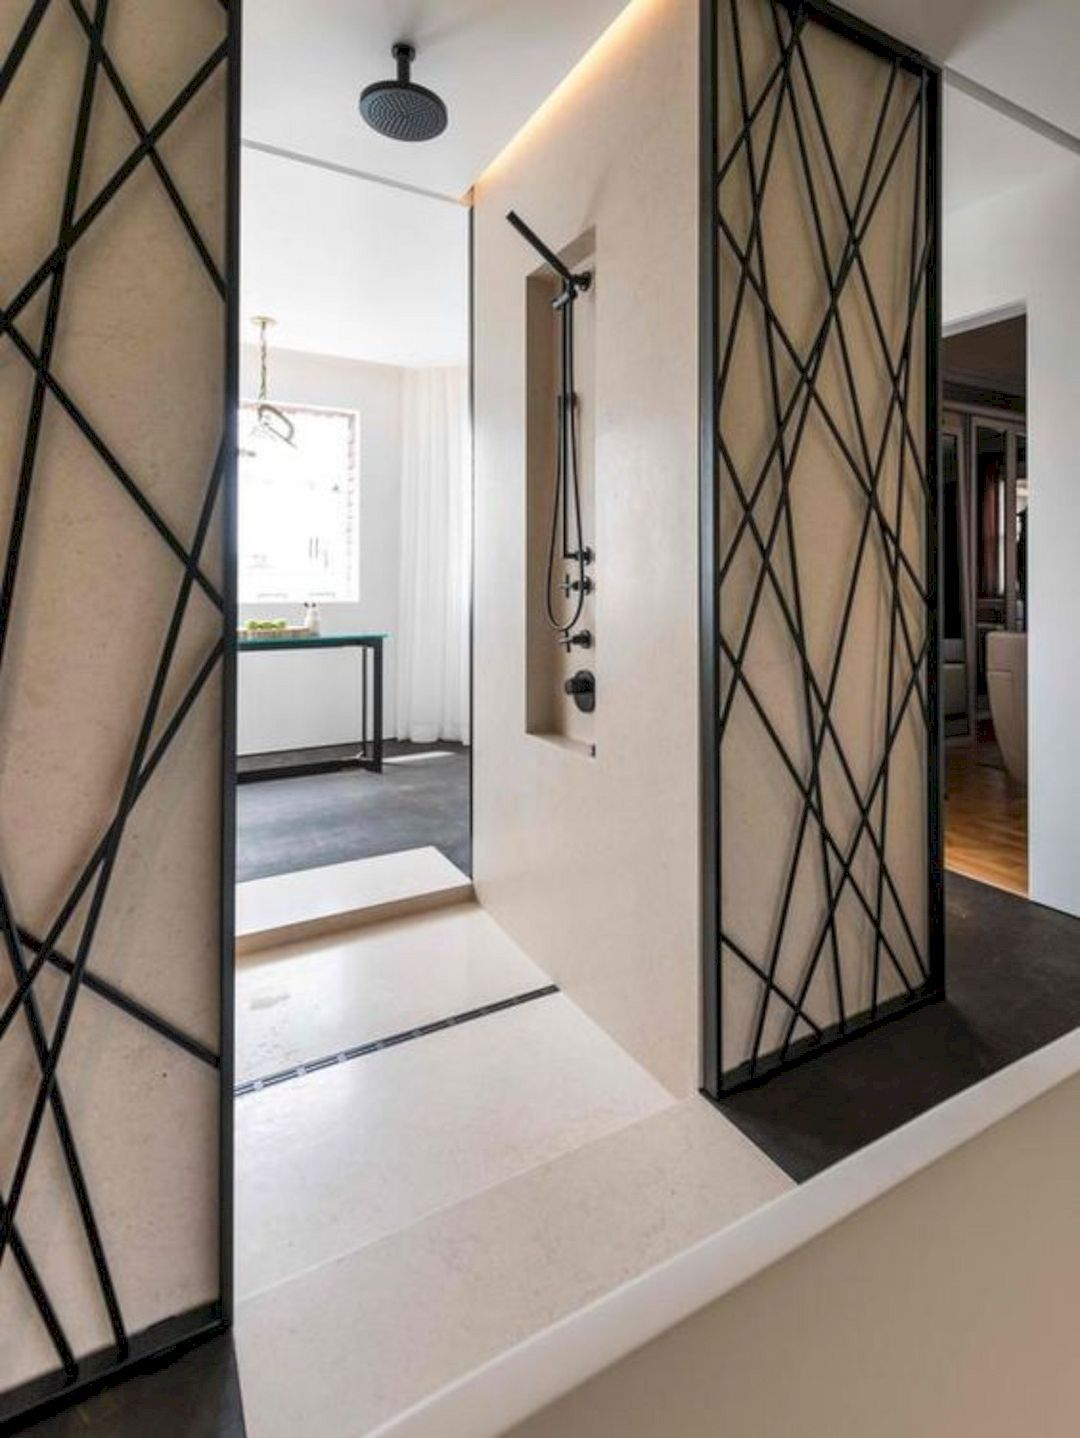 10 superb iron wall decorations modern wall decor on bathroom wall decor id=40995